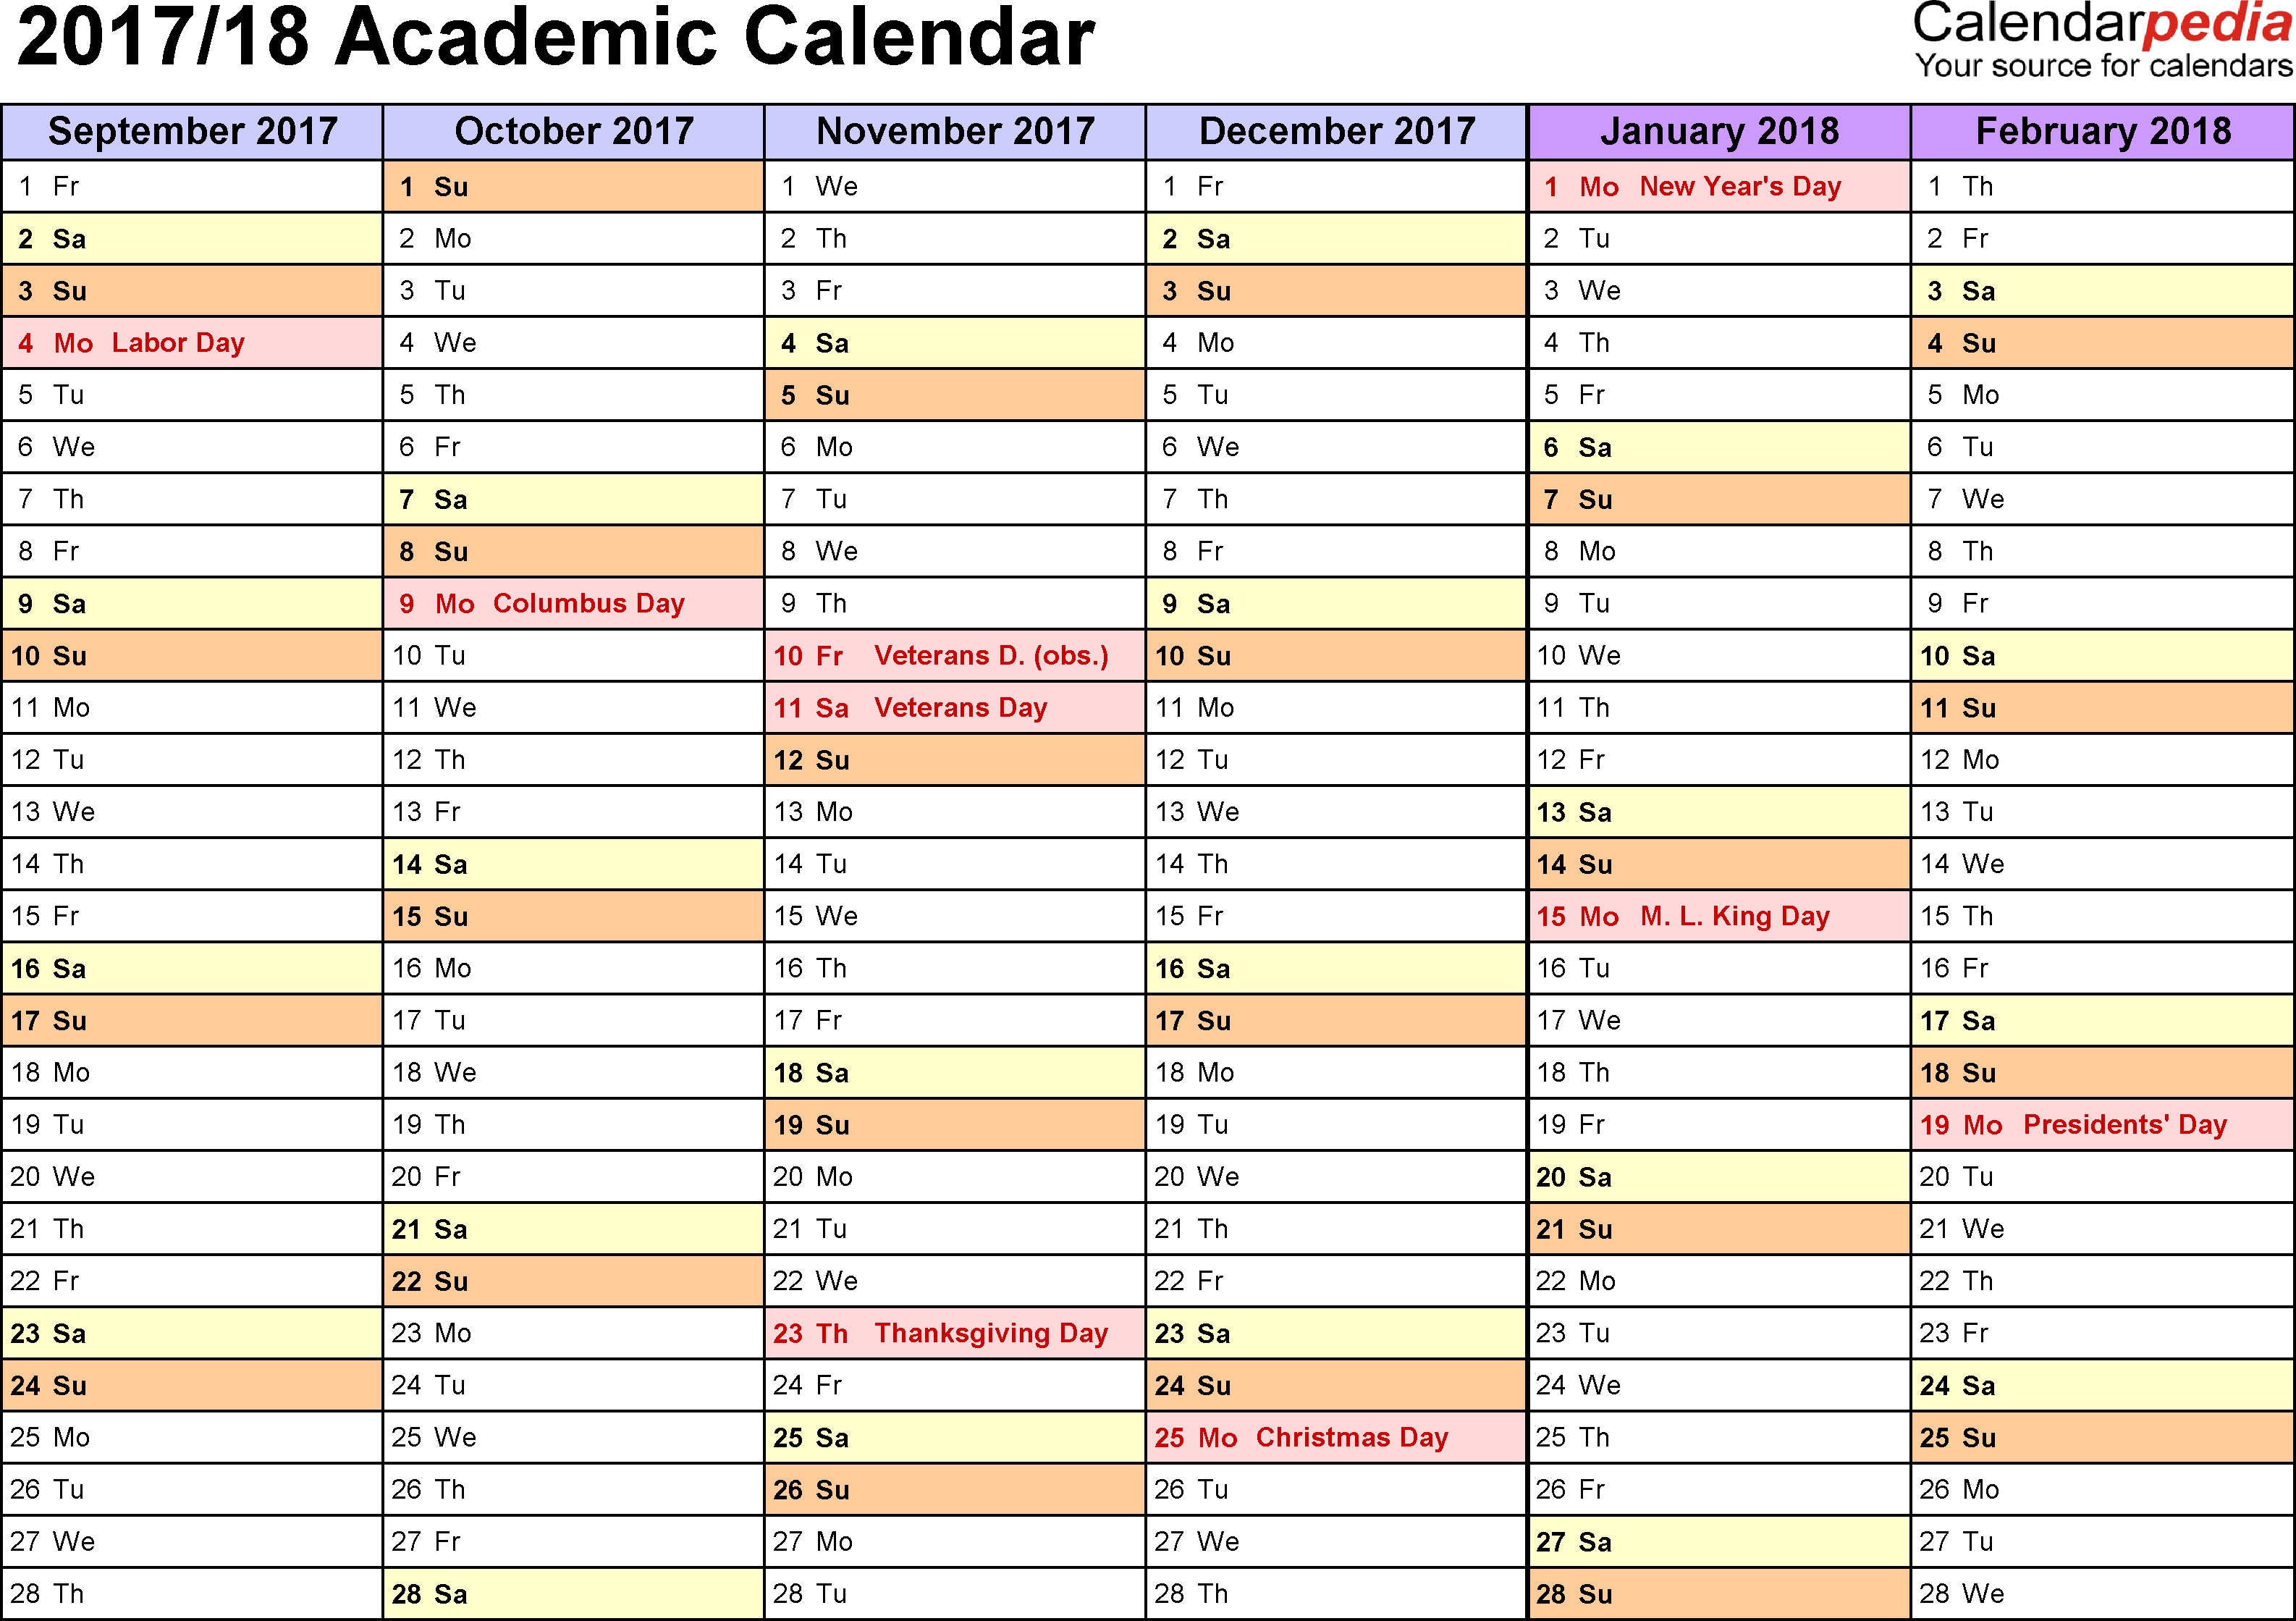 Academic Calendars 2017/2018 - Free Printable Word Templates throughout Academic Calendar Template